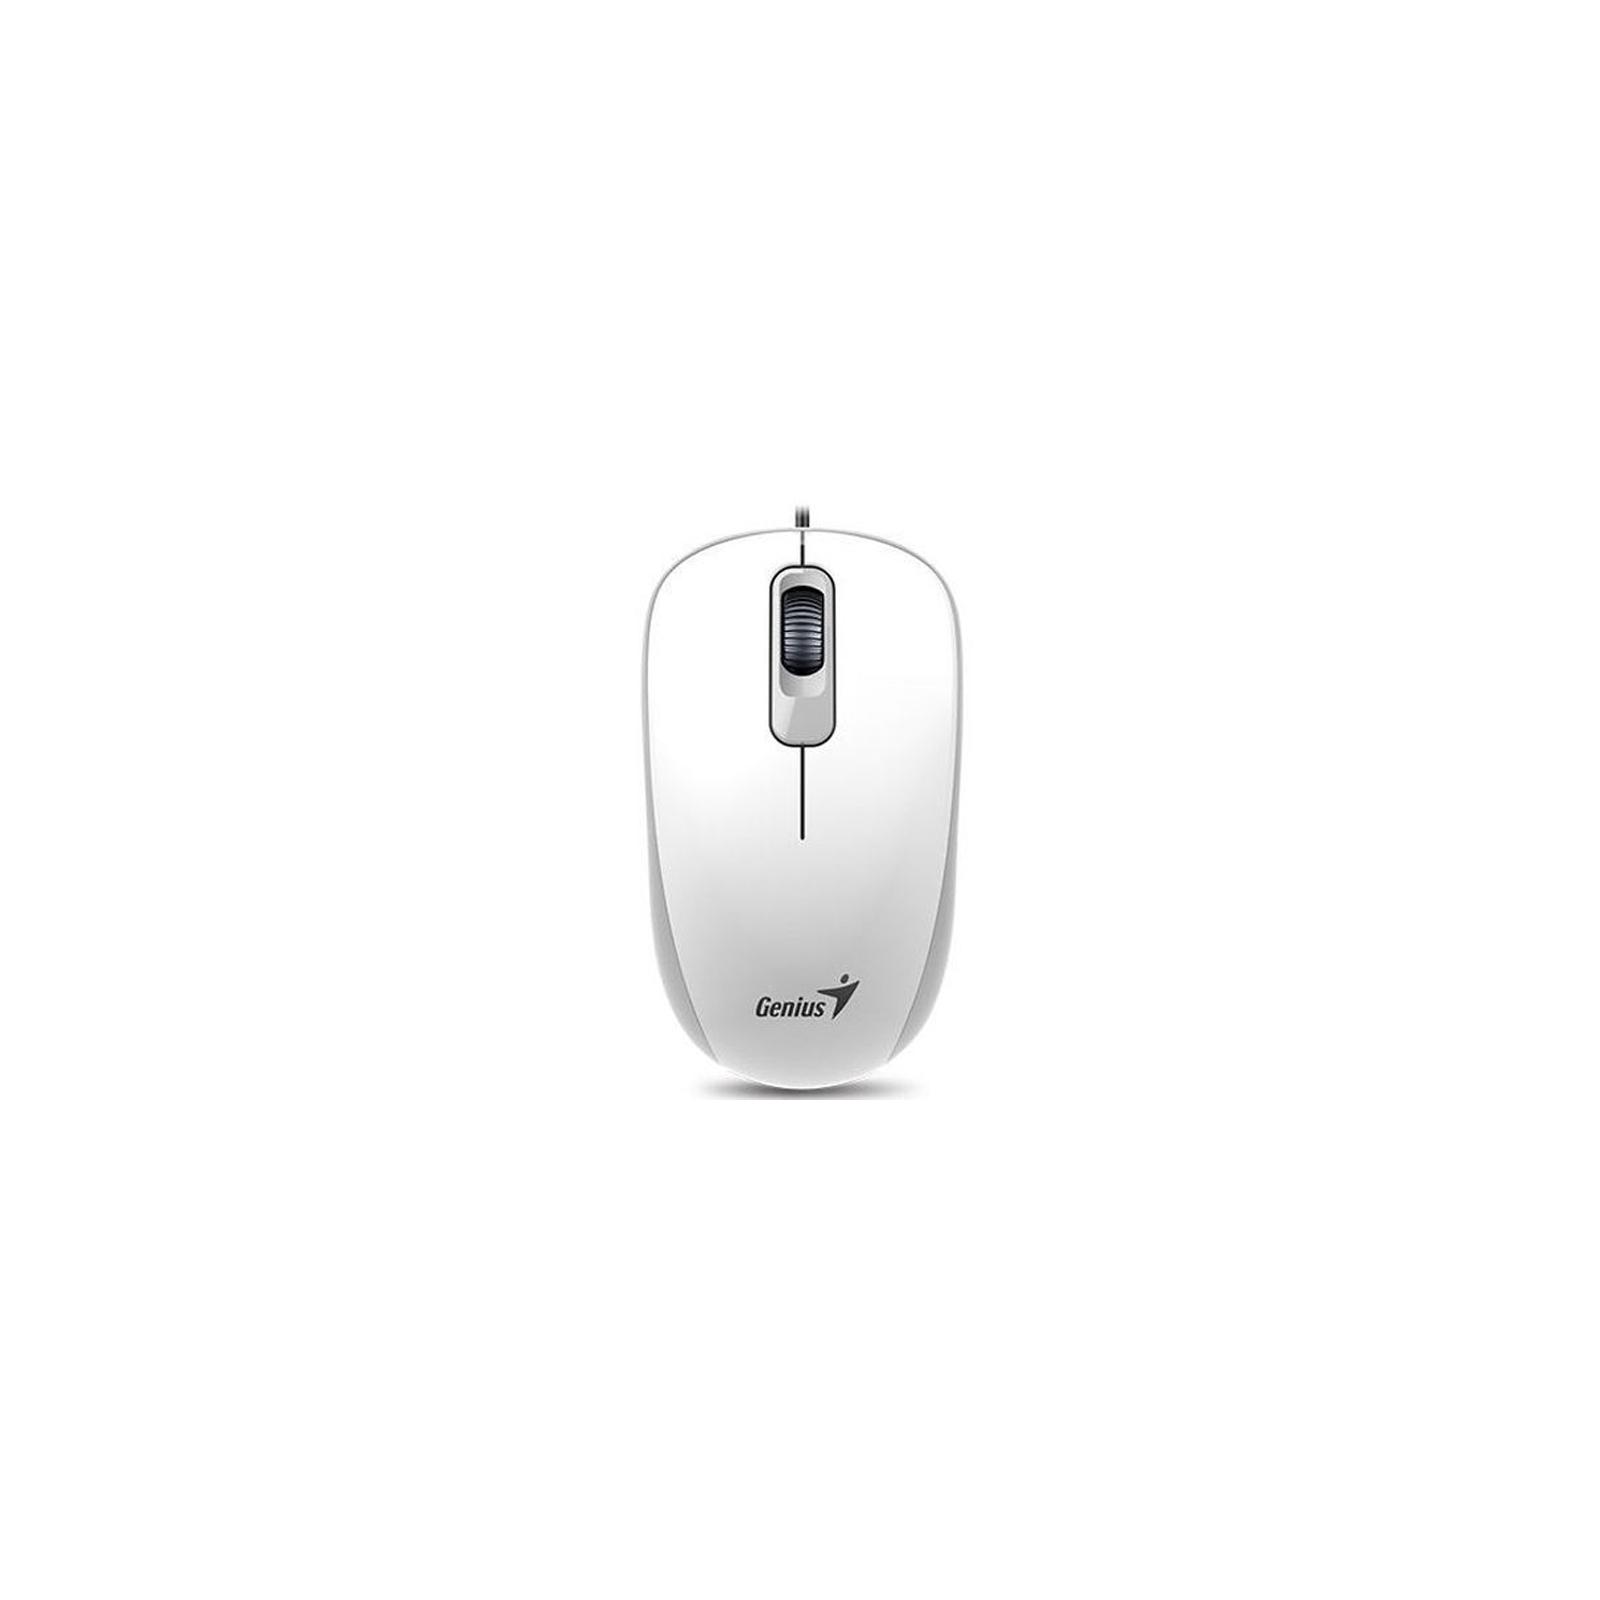 Мышка Genius DX-110 USB White (31010116102) изображение 2